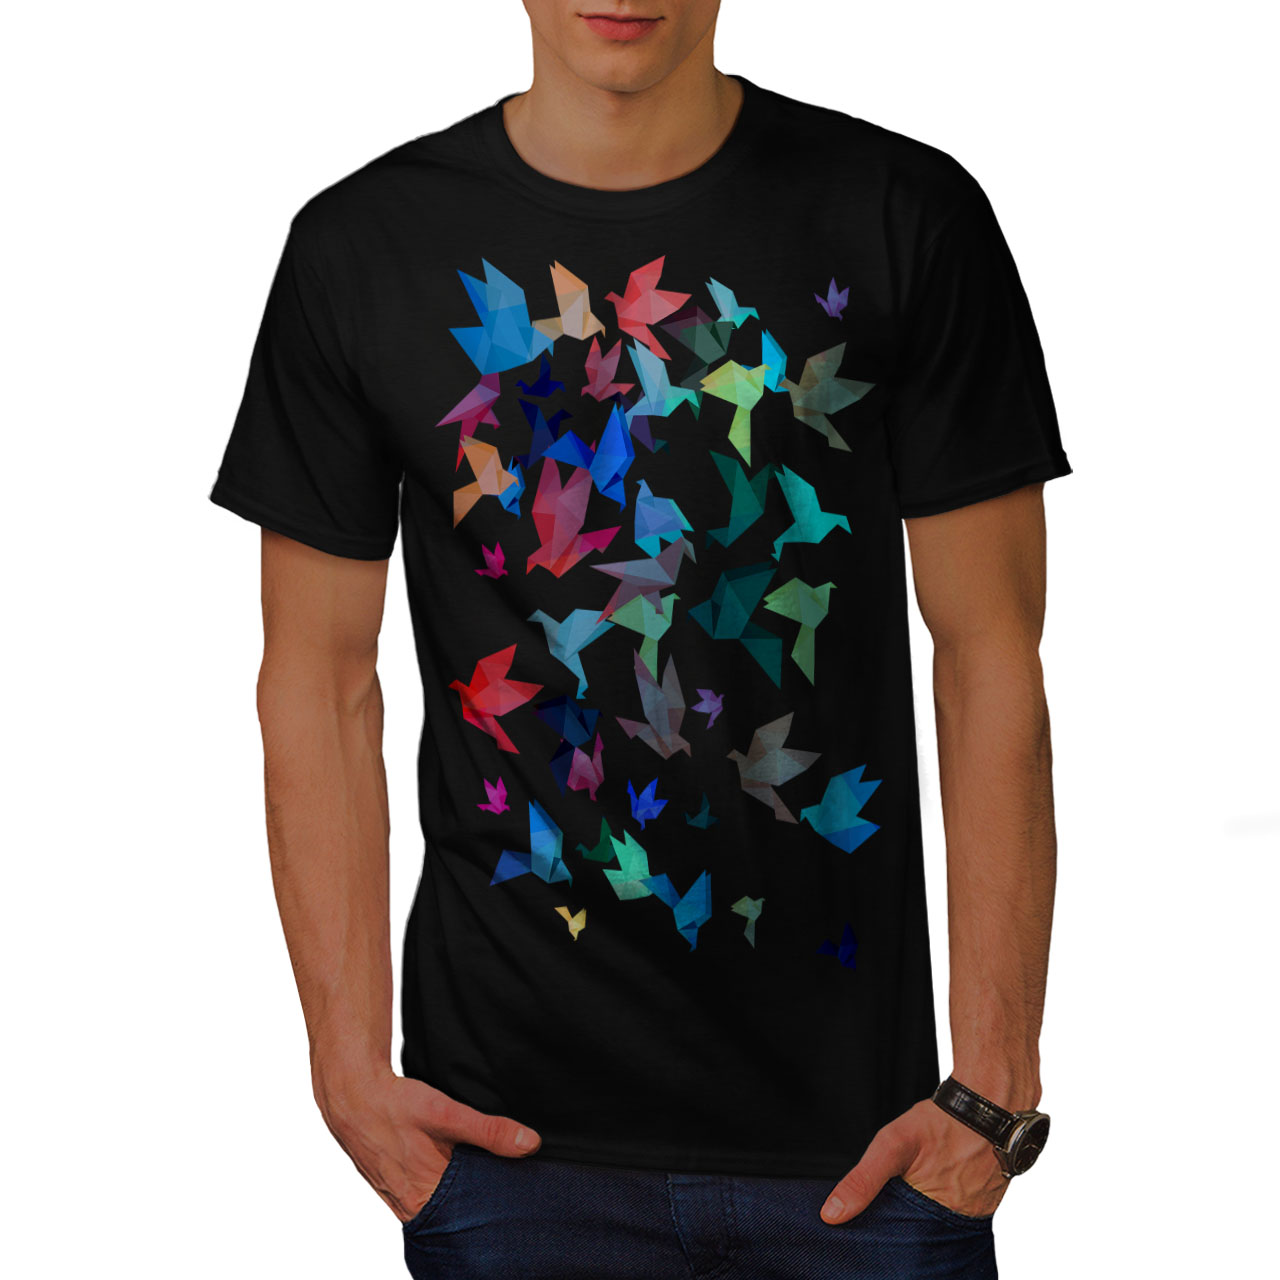 Wellcoda-Origami-Bird-Colors-Mens-T-shirt-Craft-Graphic-Design-Printed-Tee thumbnail 3